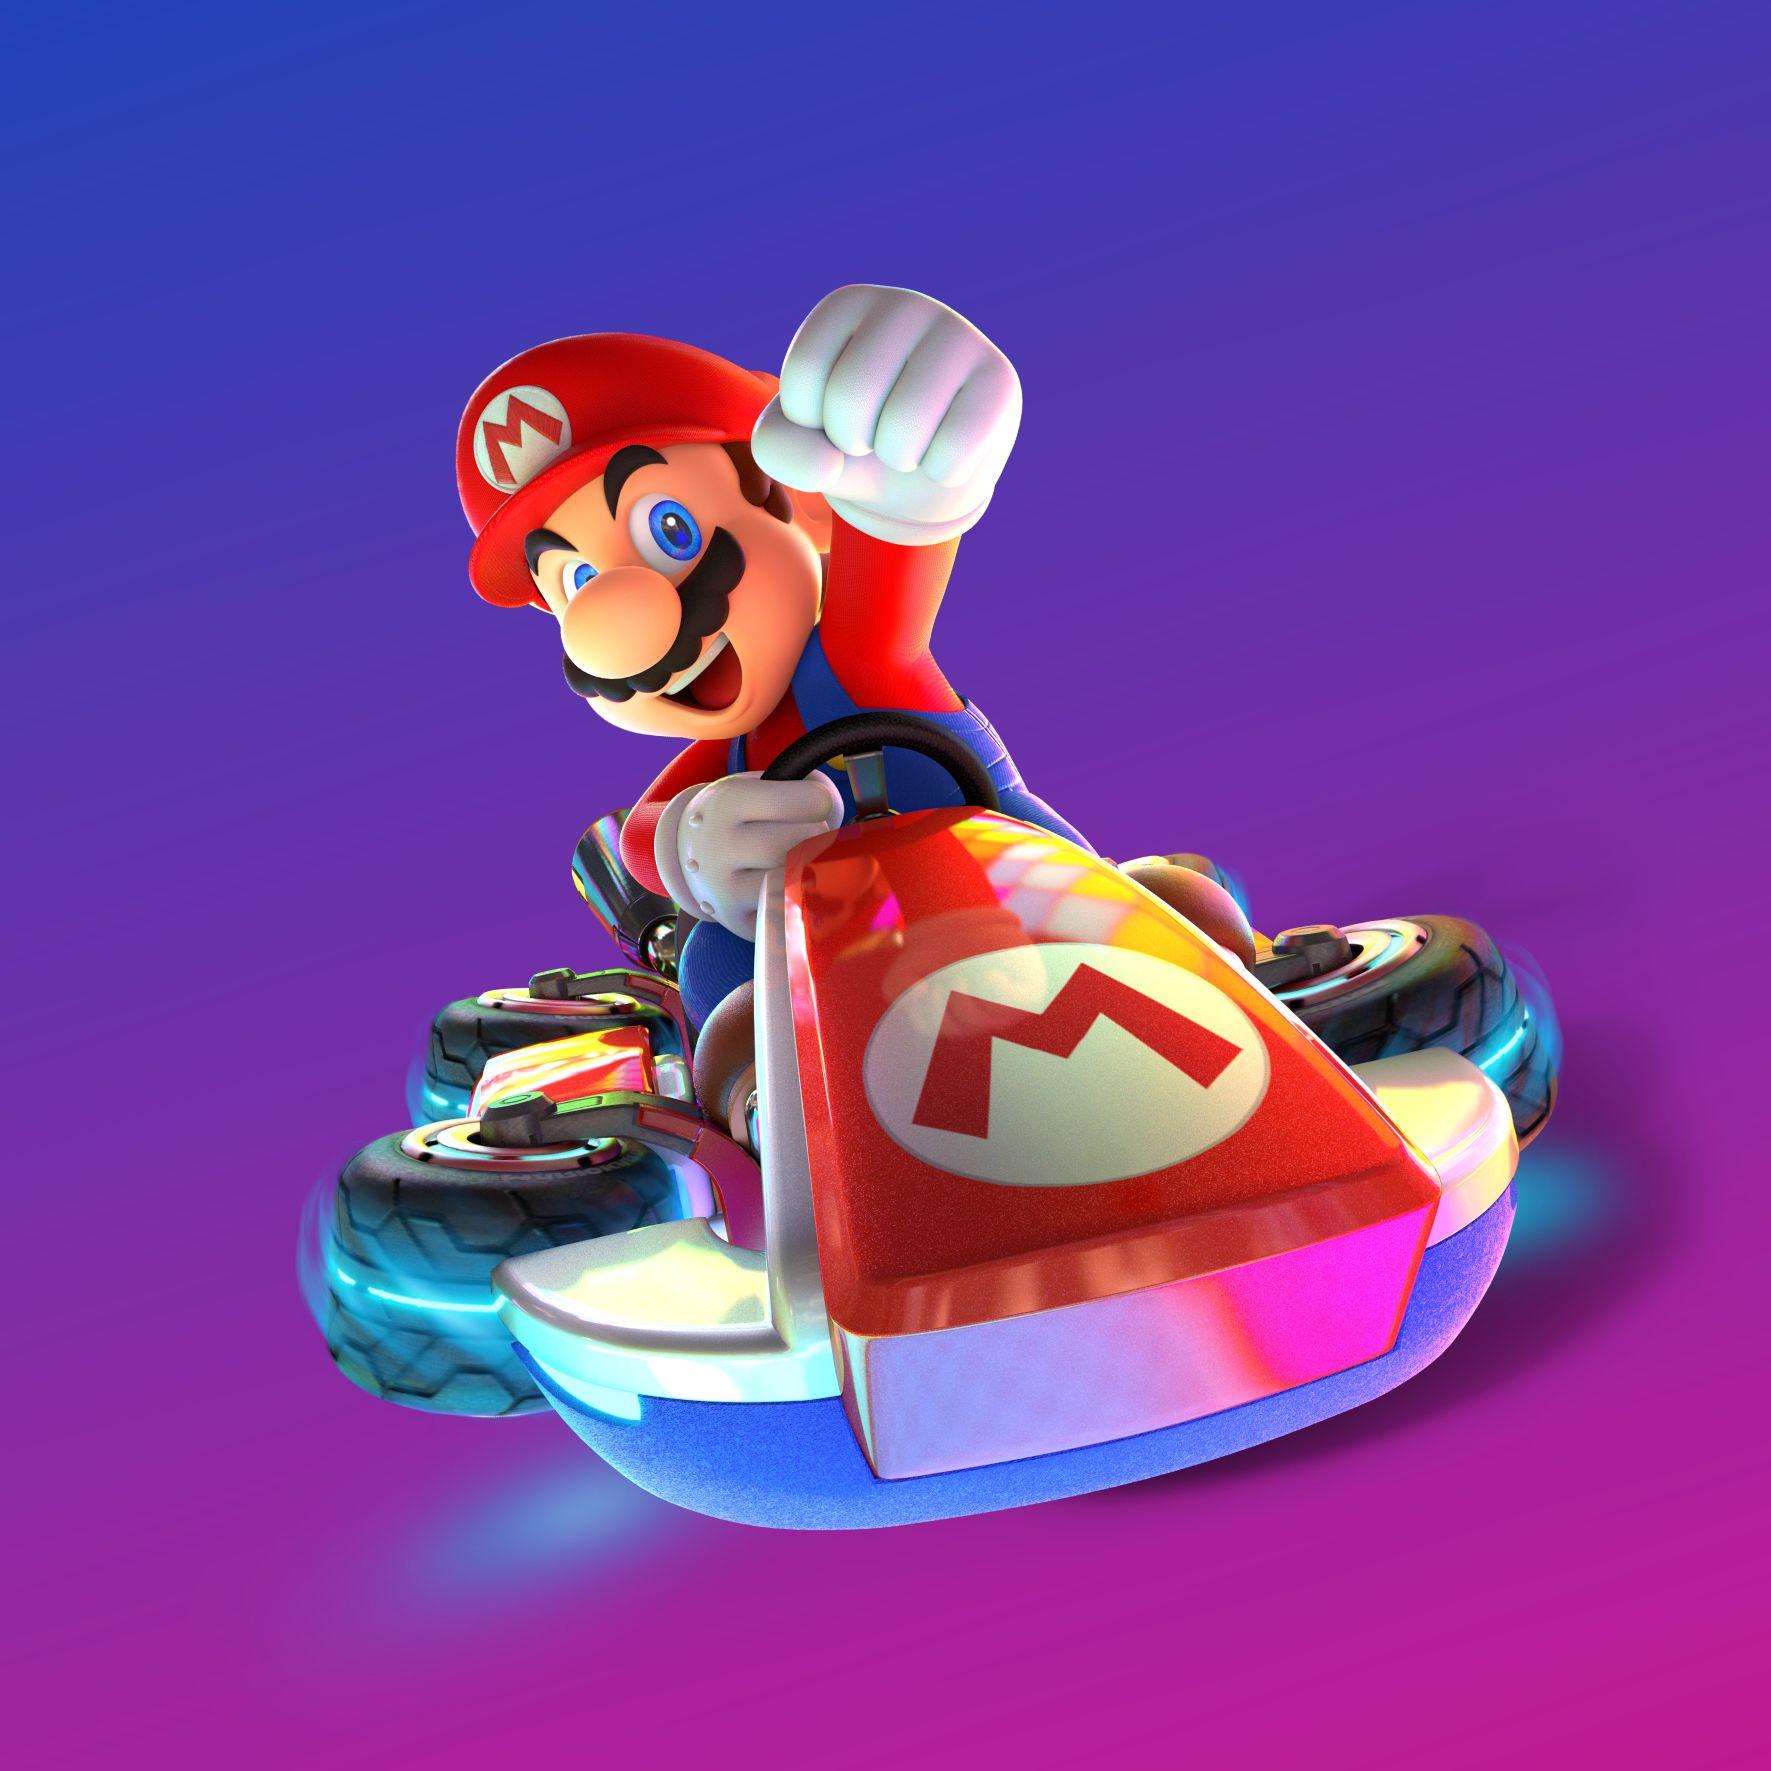 Mario Kart 8 Deluxe Hd Artwork Mario Kart Mario Mario Kart Party